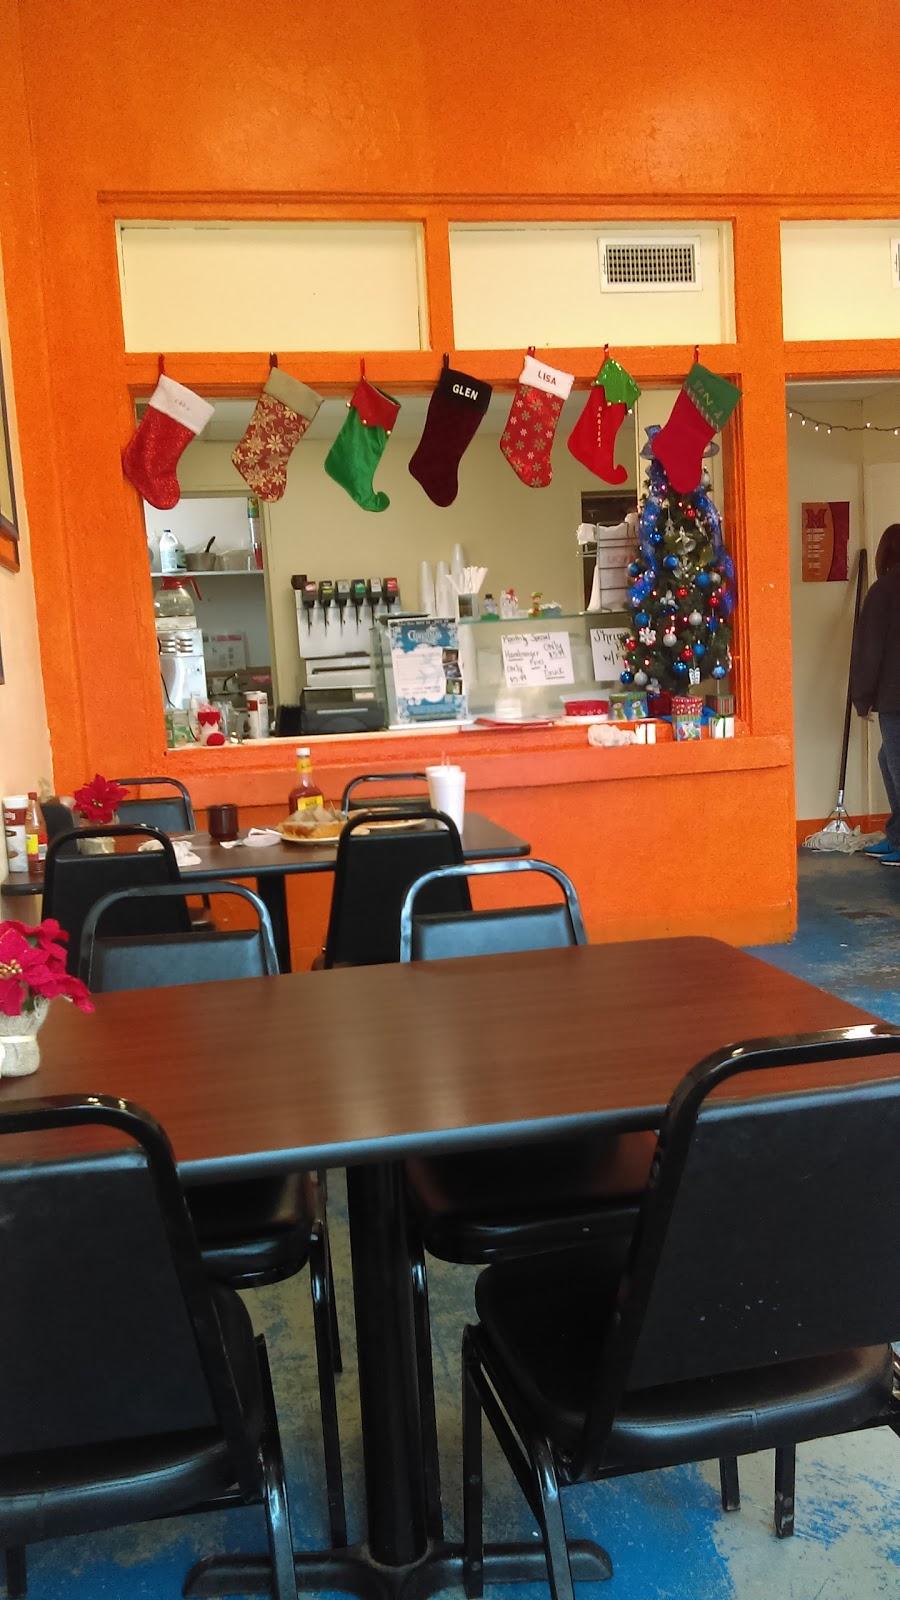 Gulf Station Cafe - cafe    Photo 8 of 10   Address: 1040 San Antonio Ave, Many, LA 71449, USA   Phone: (318) 273-2233